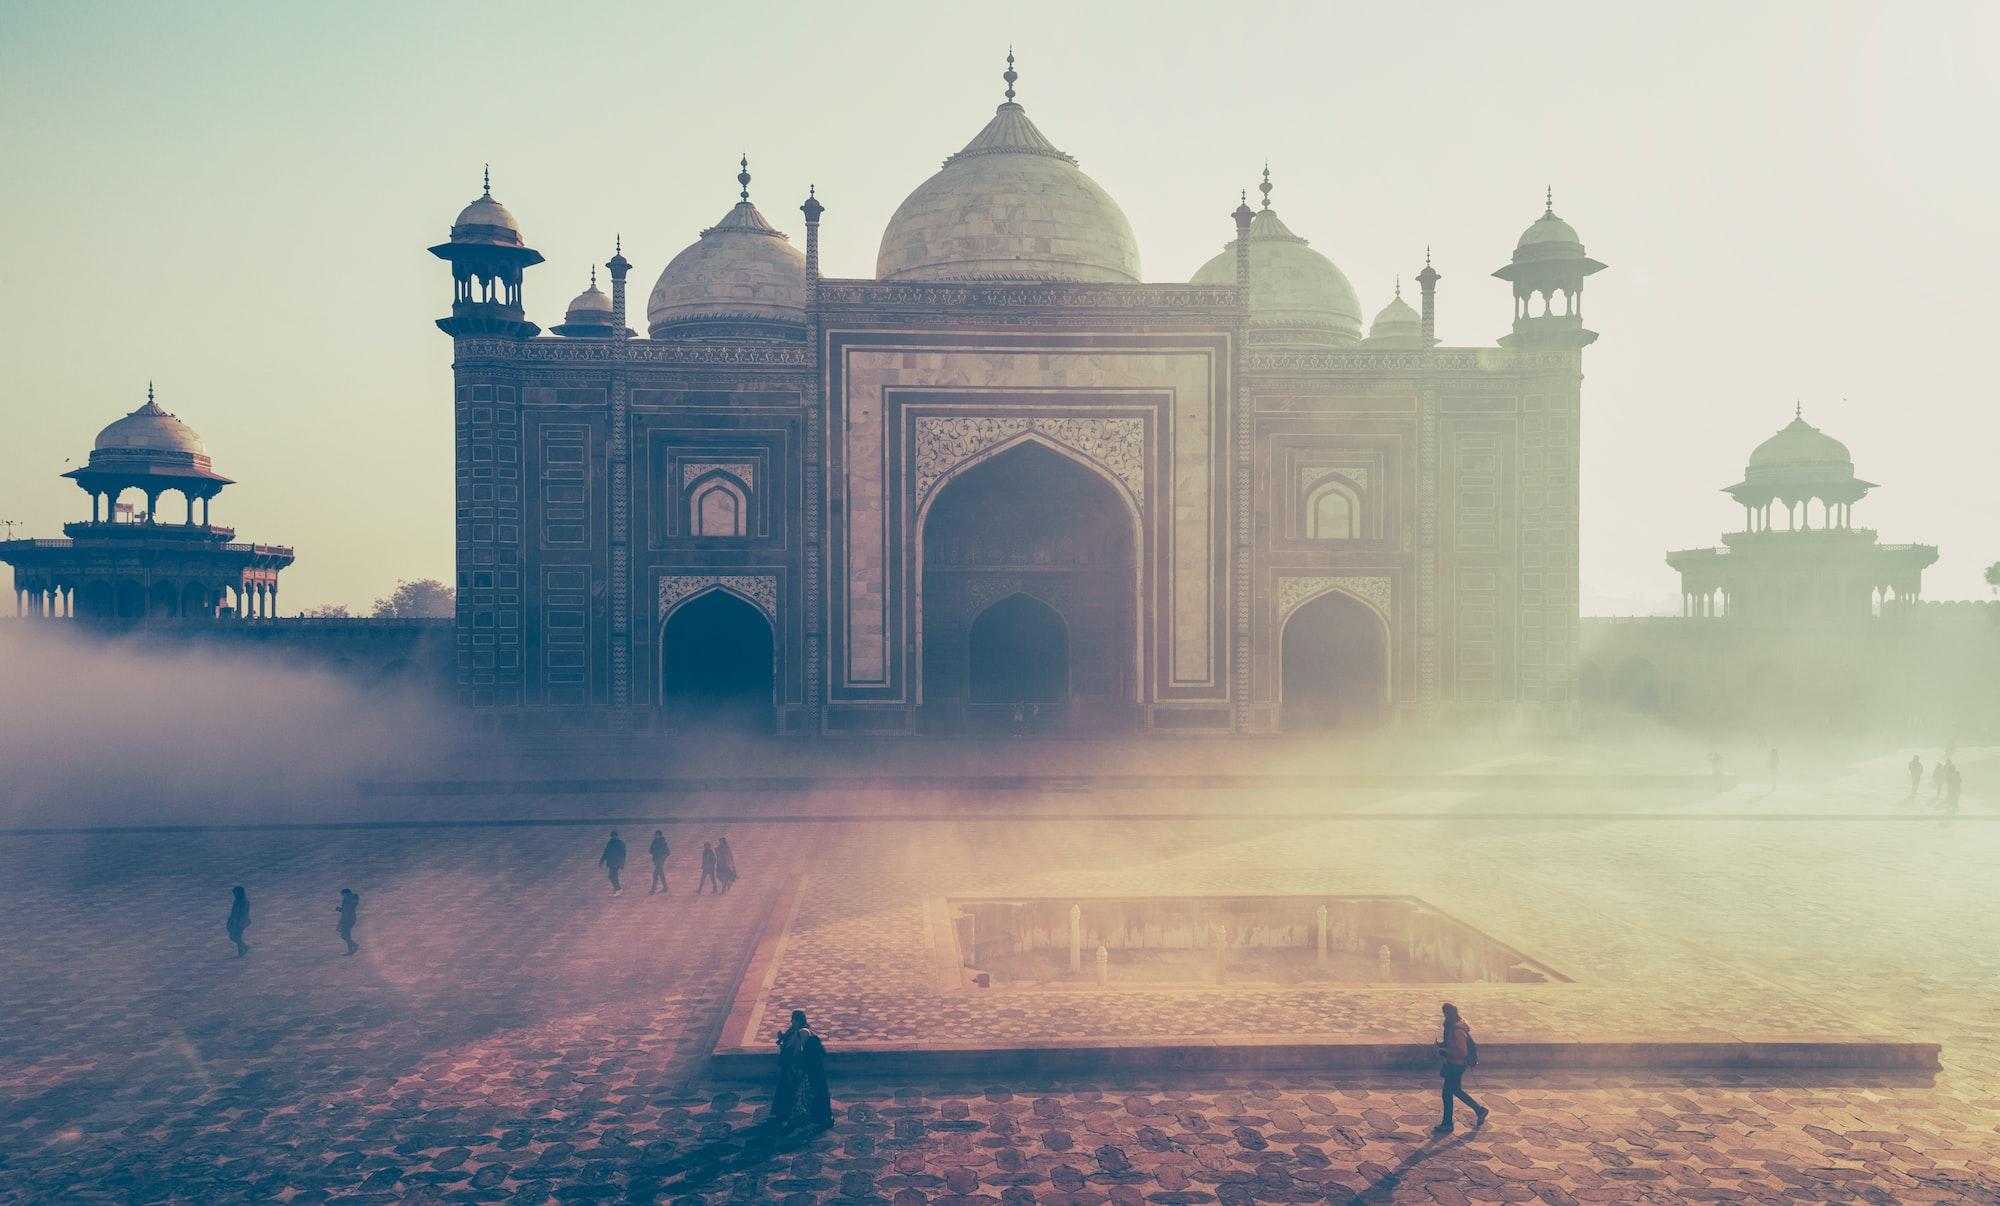 Architecture in Agra